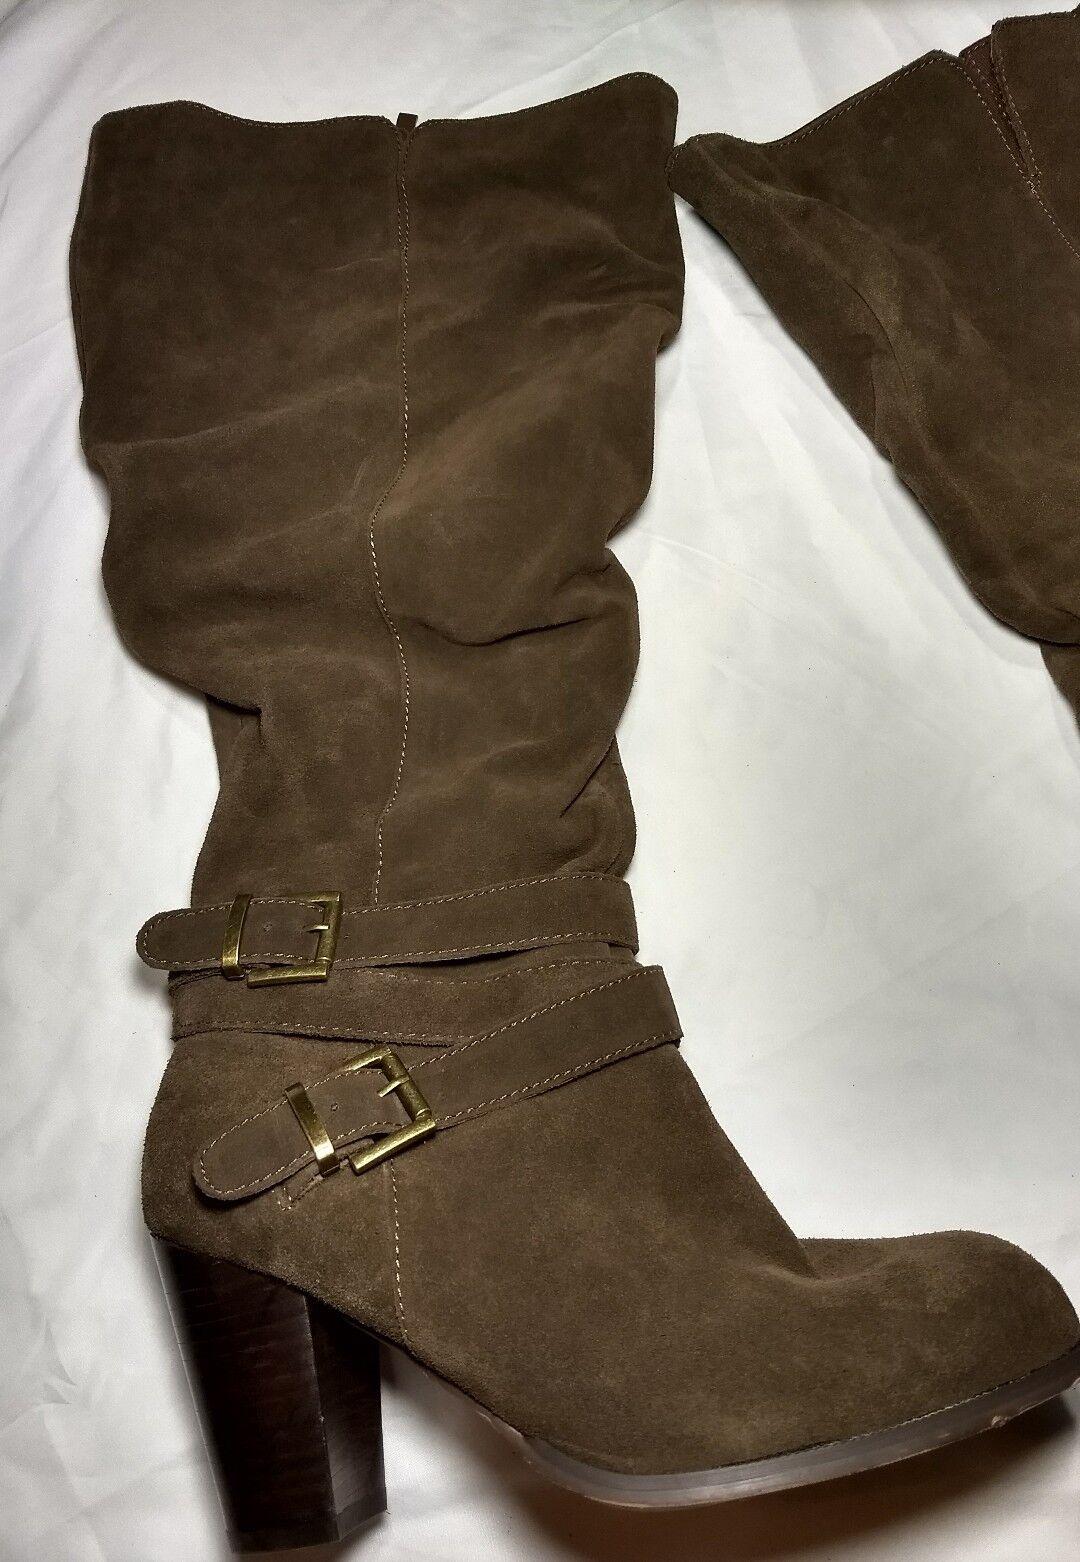 Torrid Größe 10 Braun Genuine Suede Buckle Ankle Slouchy Stiefel Wide Width Calf